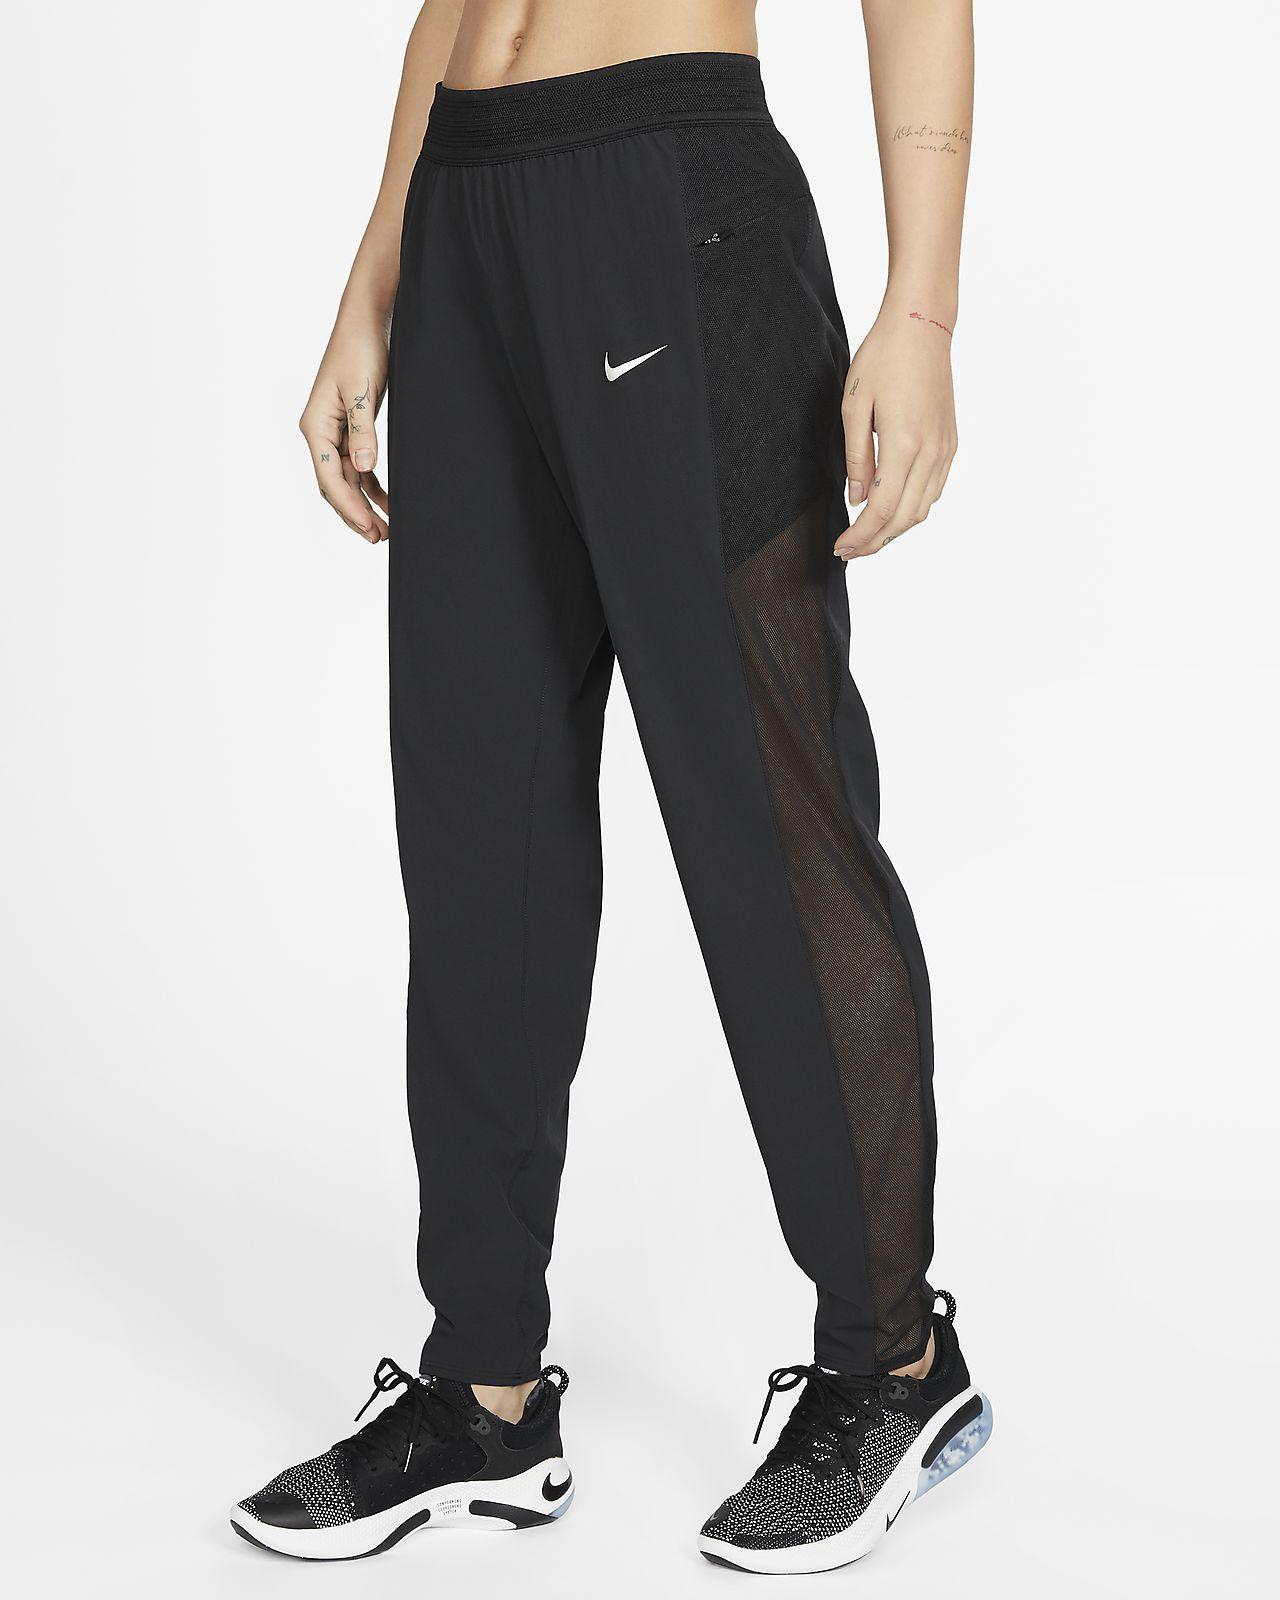 Dámské běžecké kalhoty Nike Essential